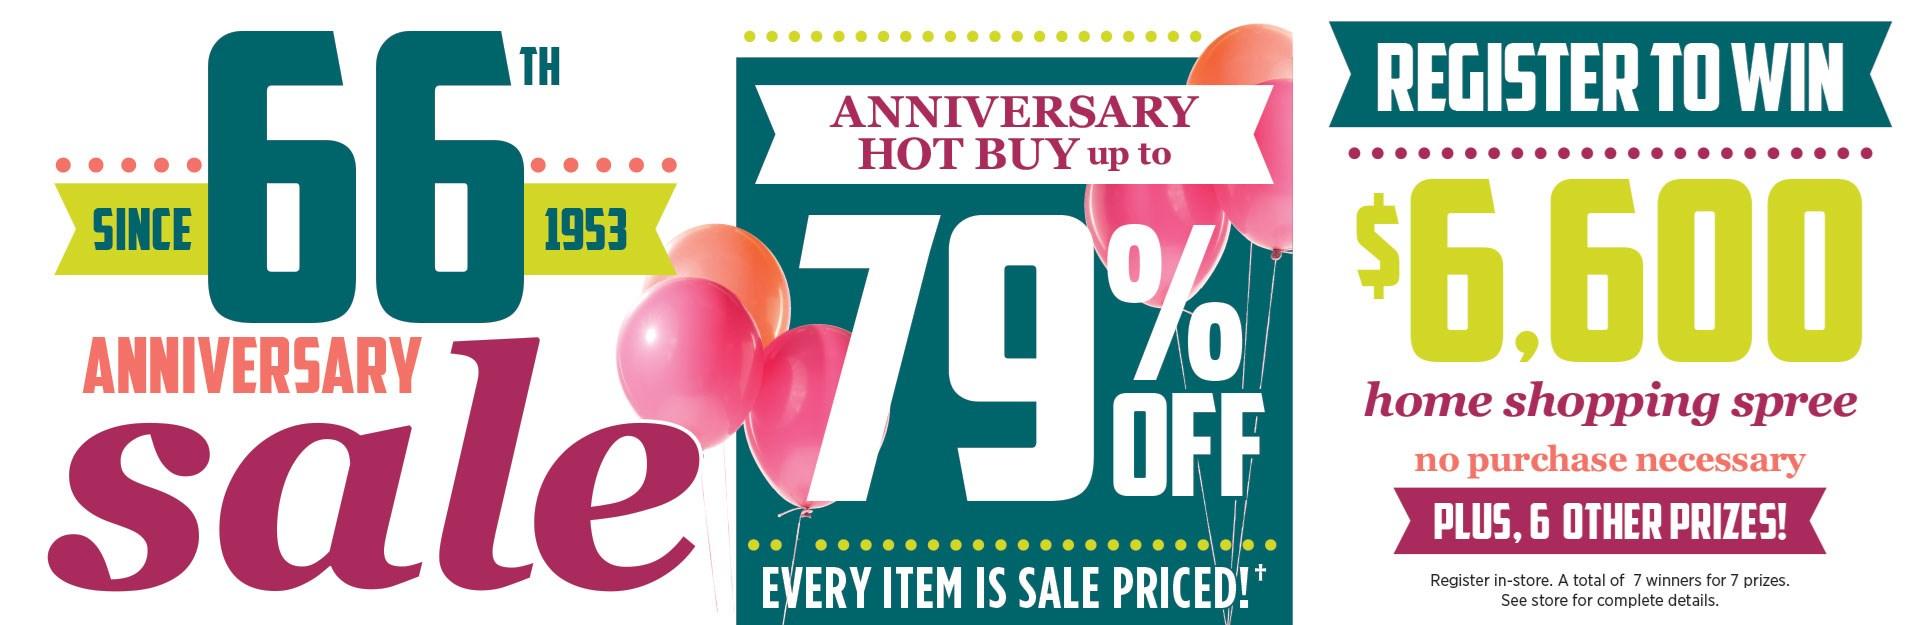 anniversary-sale-2019